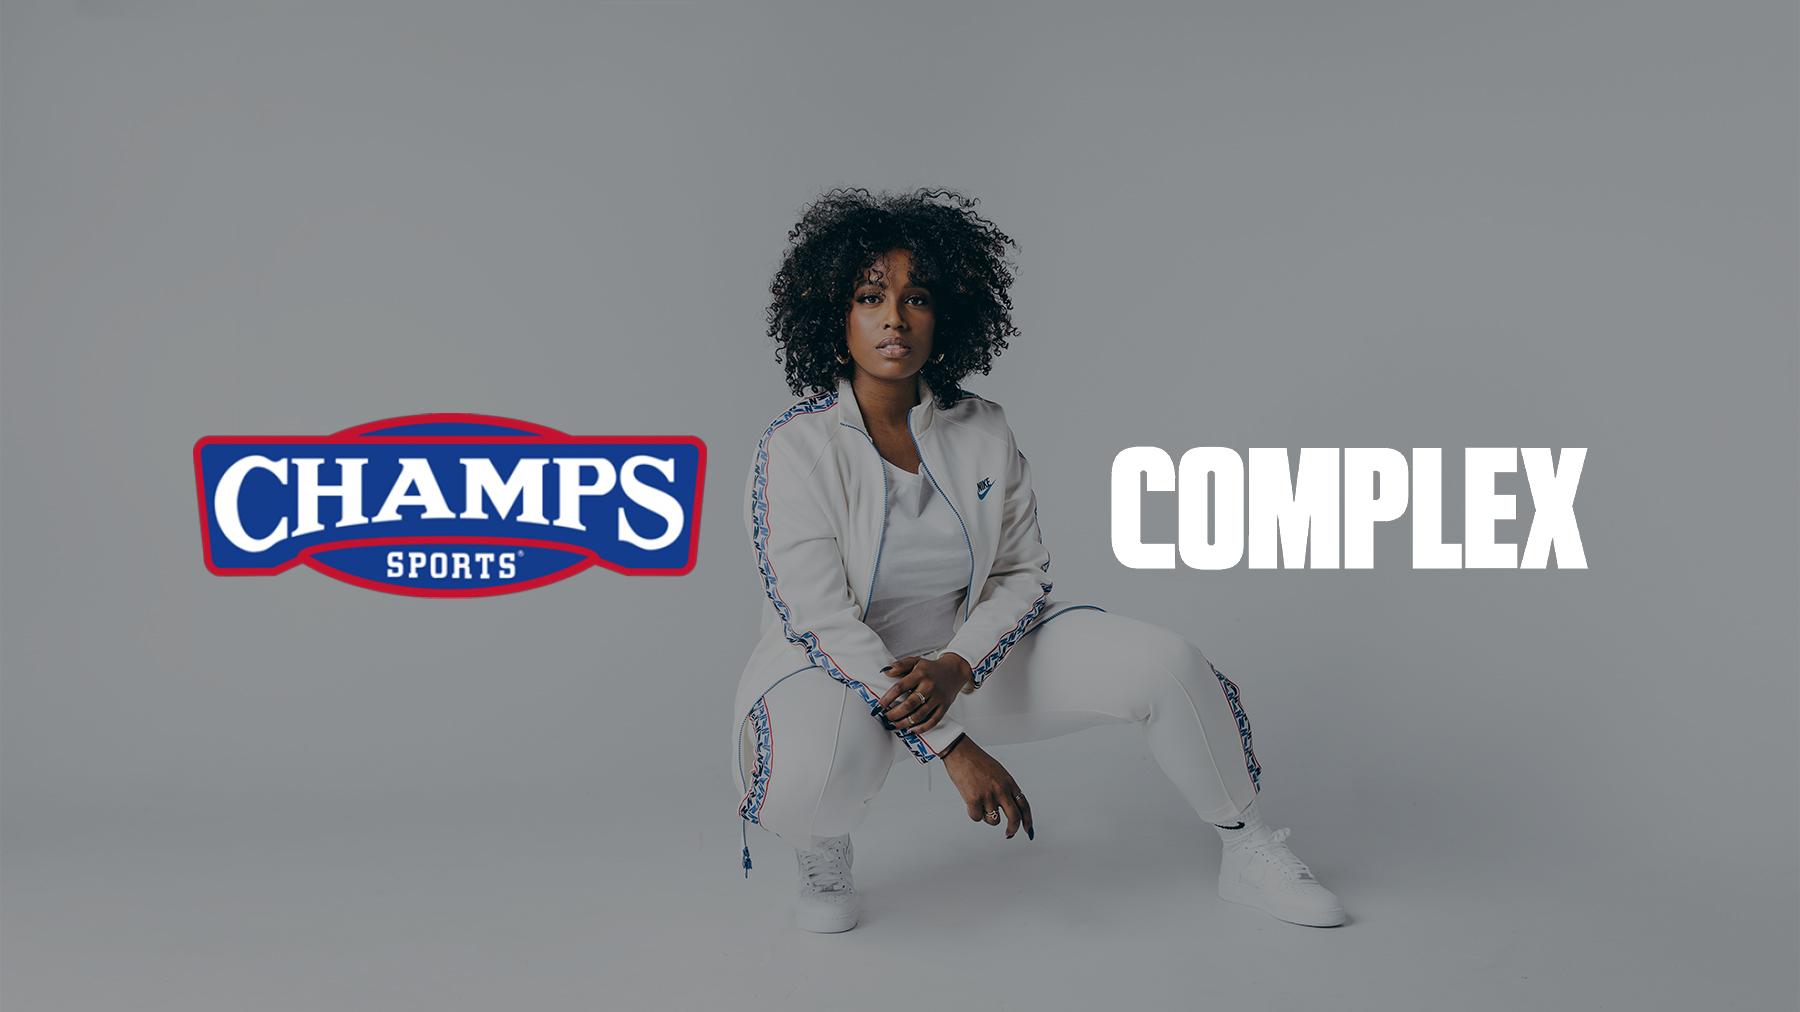 Champs x Complex